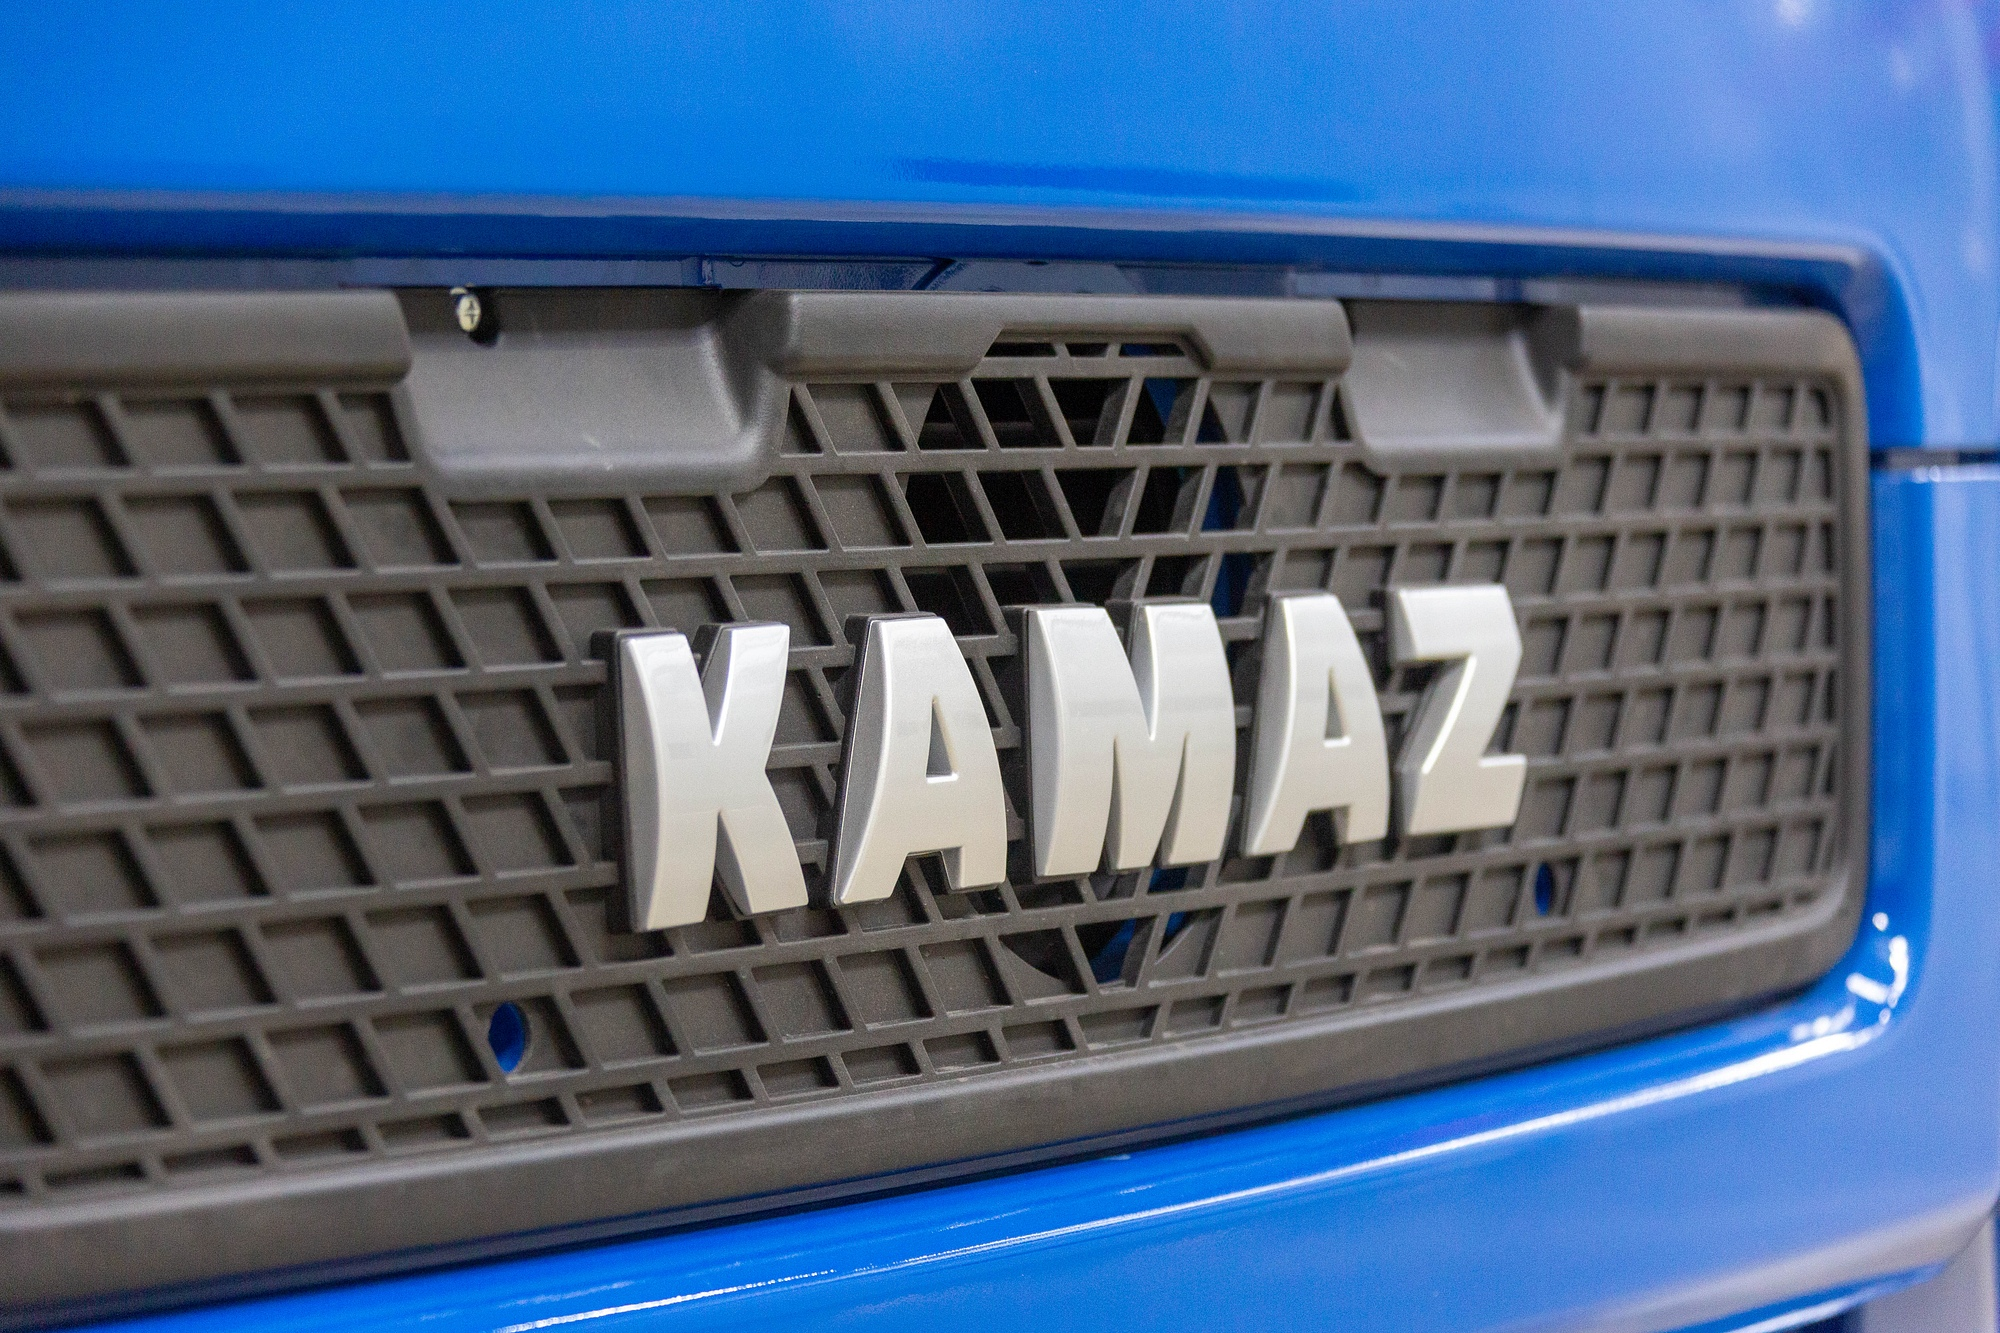 IT-страхование для автомобилей КАМАЗ